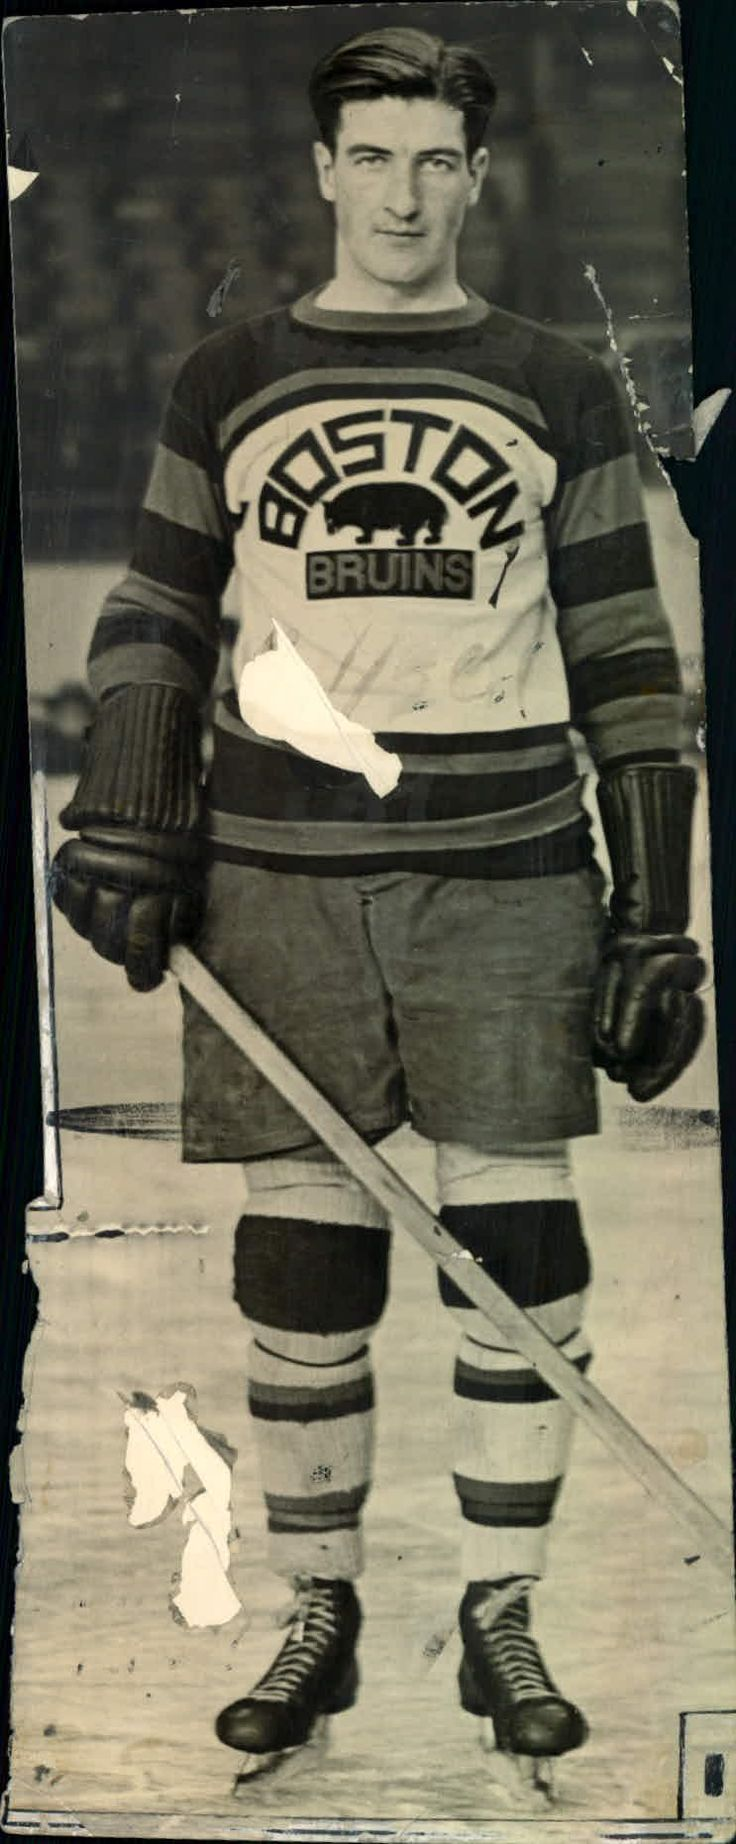 1929 bruins - Old School Hockey all the way!